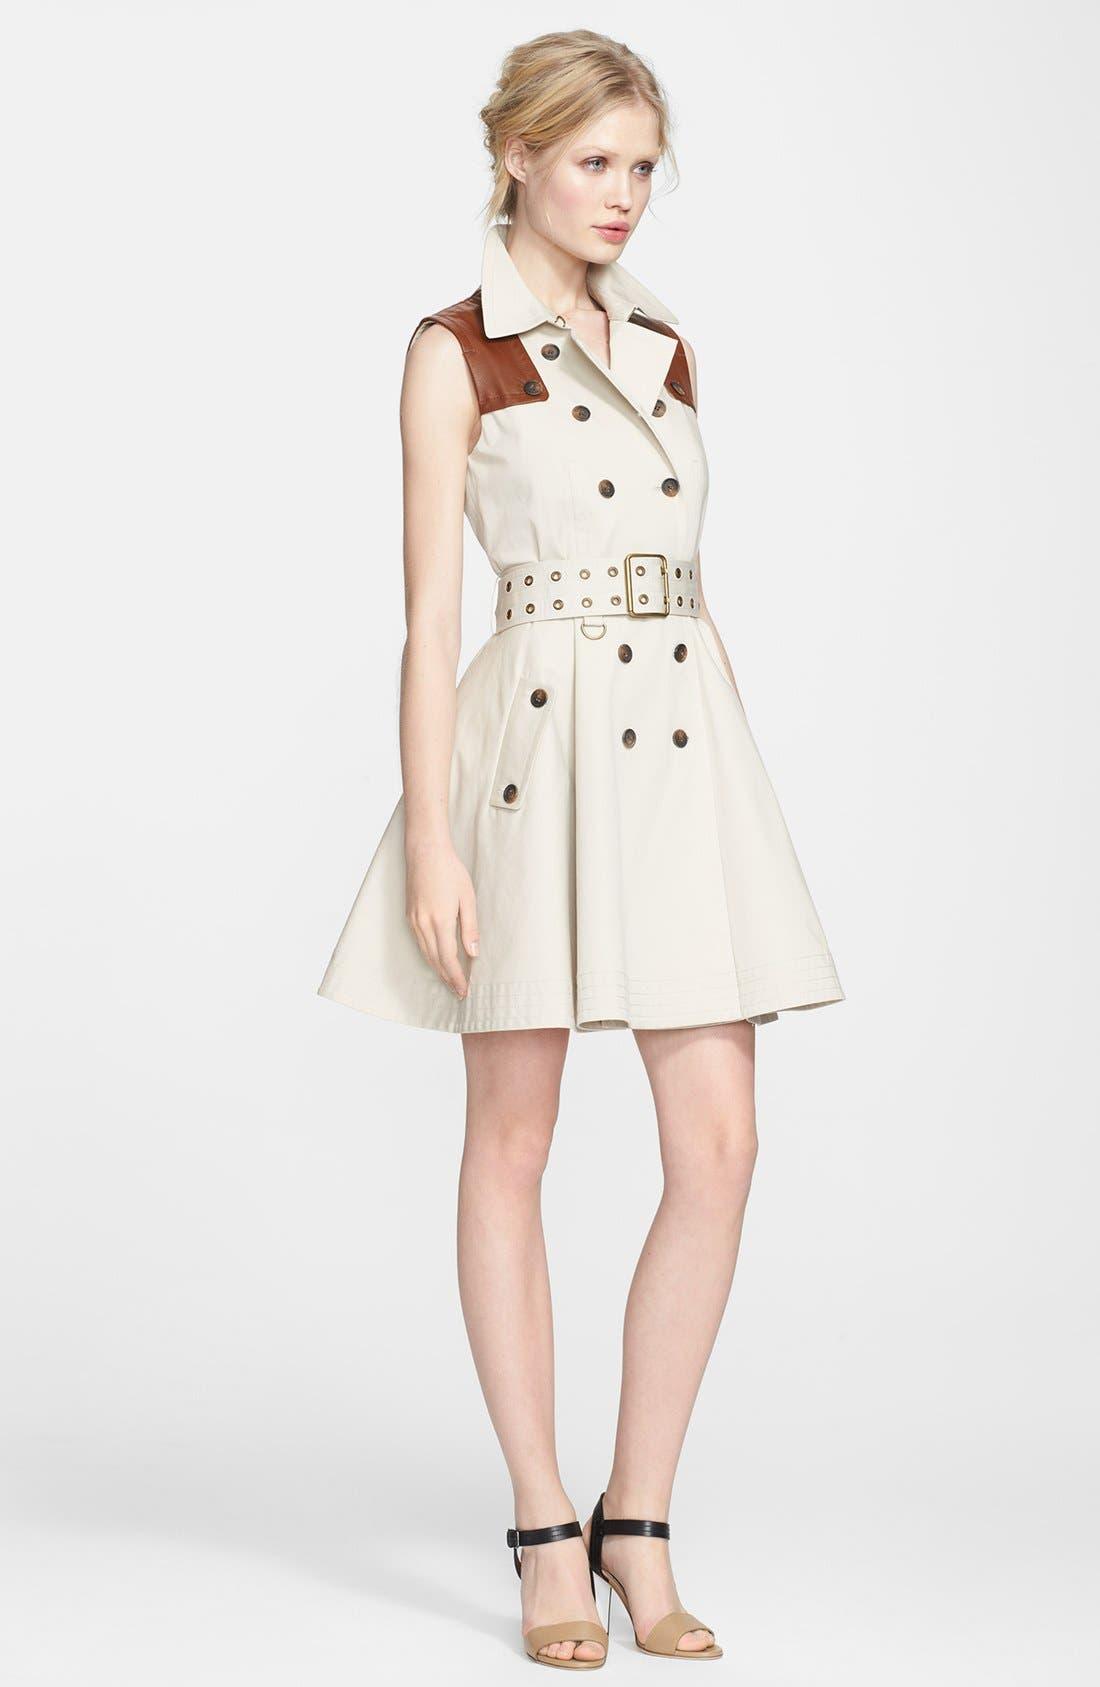 Main Image - Rachel Zoe Trench Dress & Accessories